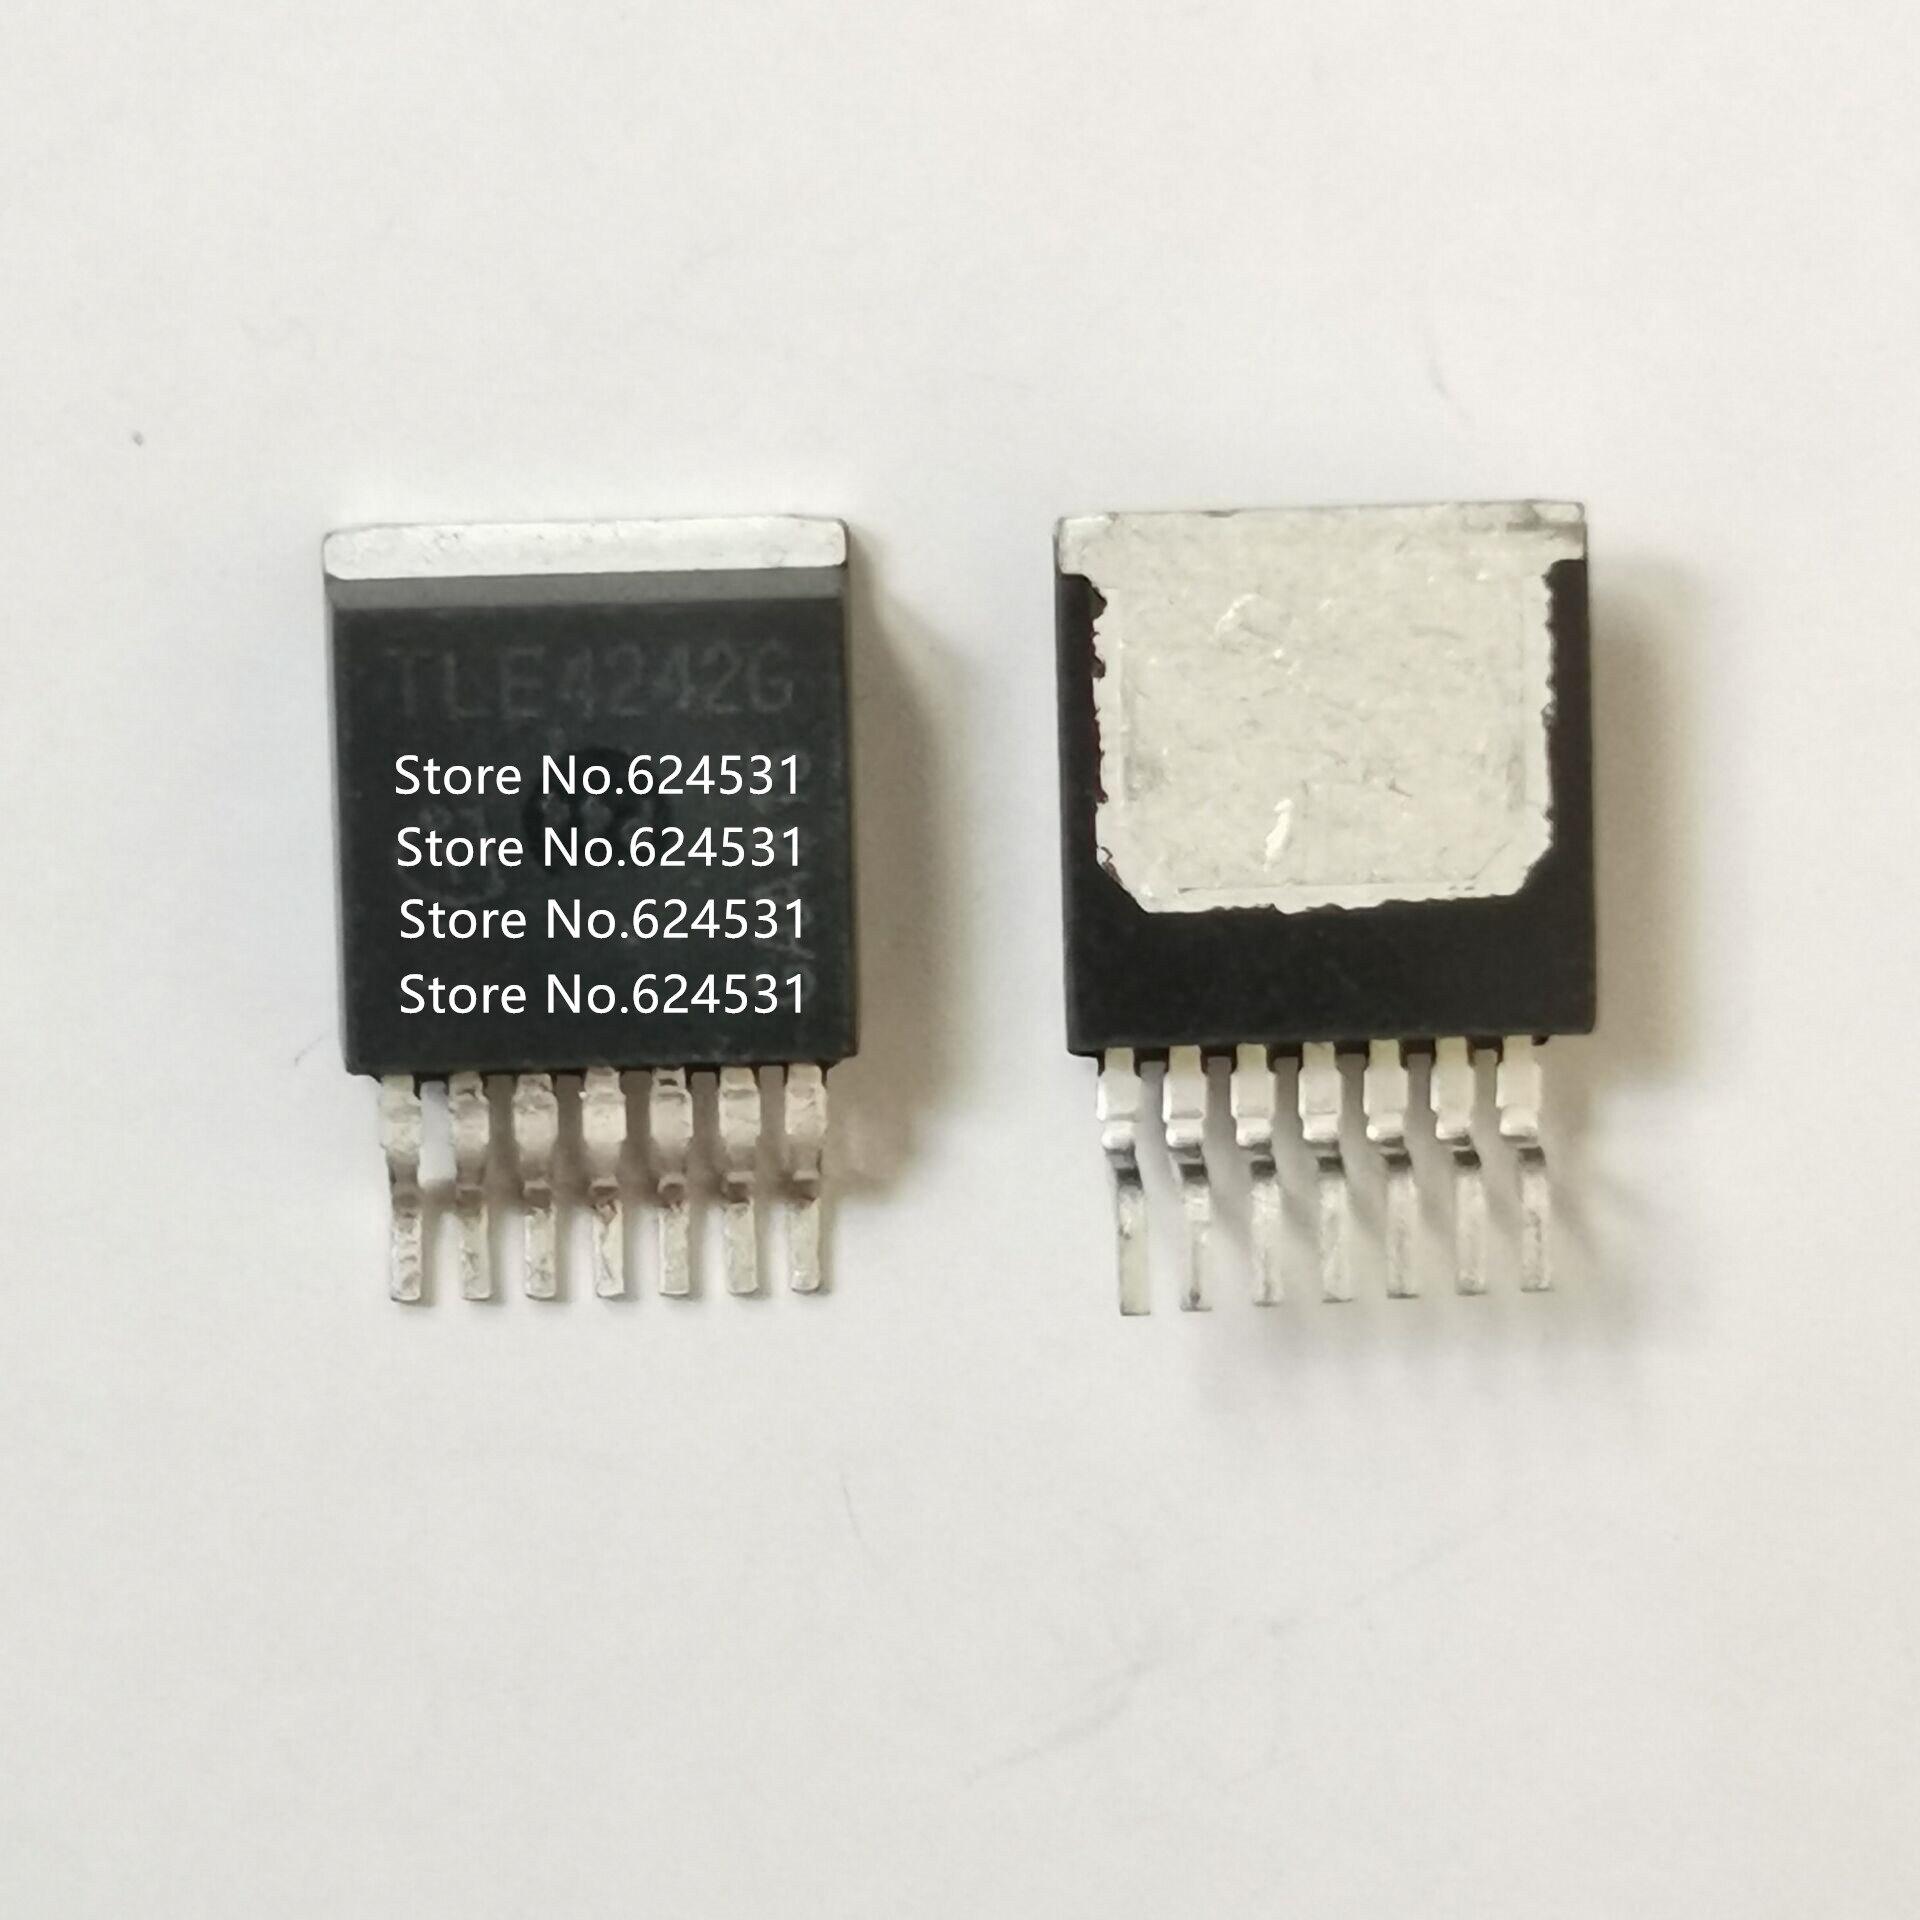 Купить с кэшбэком Hot spot 5pcs TLE4242G TO263-7 TLE4242 power chip new